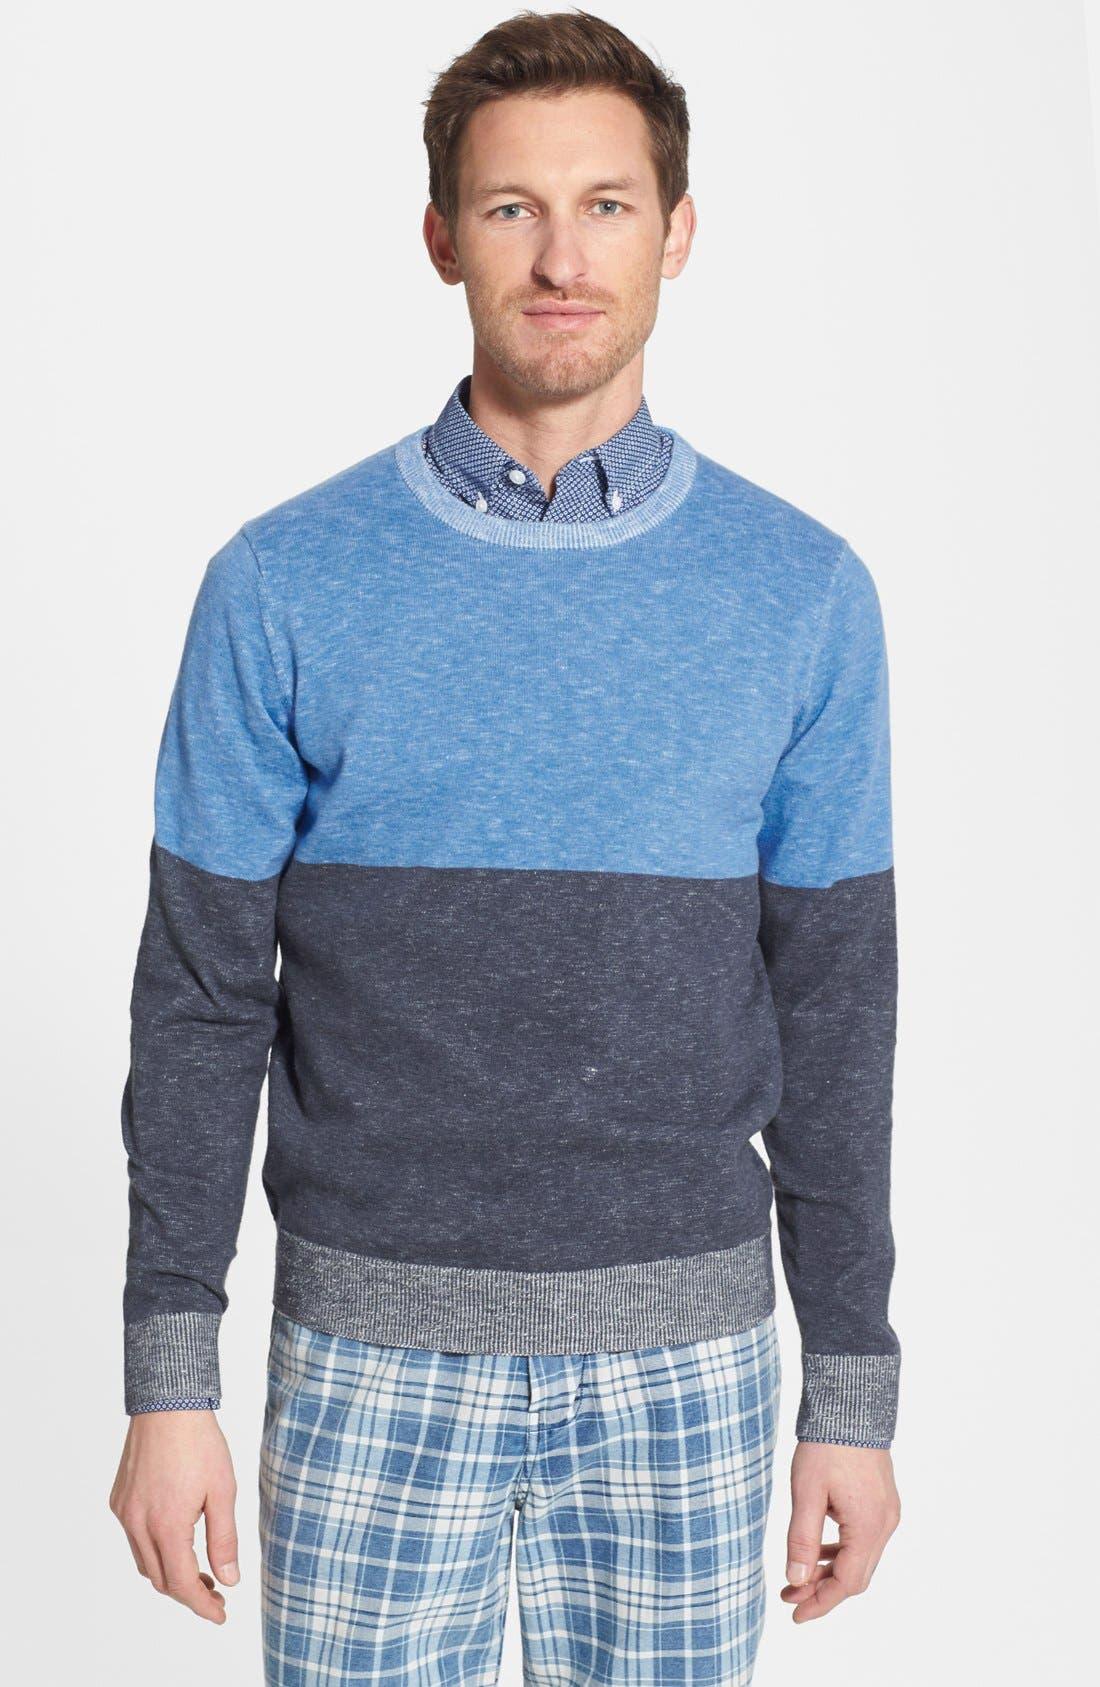 Alternate Image 1 Selected - Grayers 'Onlan' Colorblock Trim Fit Crewneck Sweater